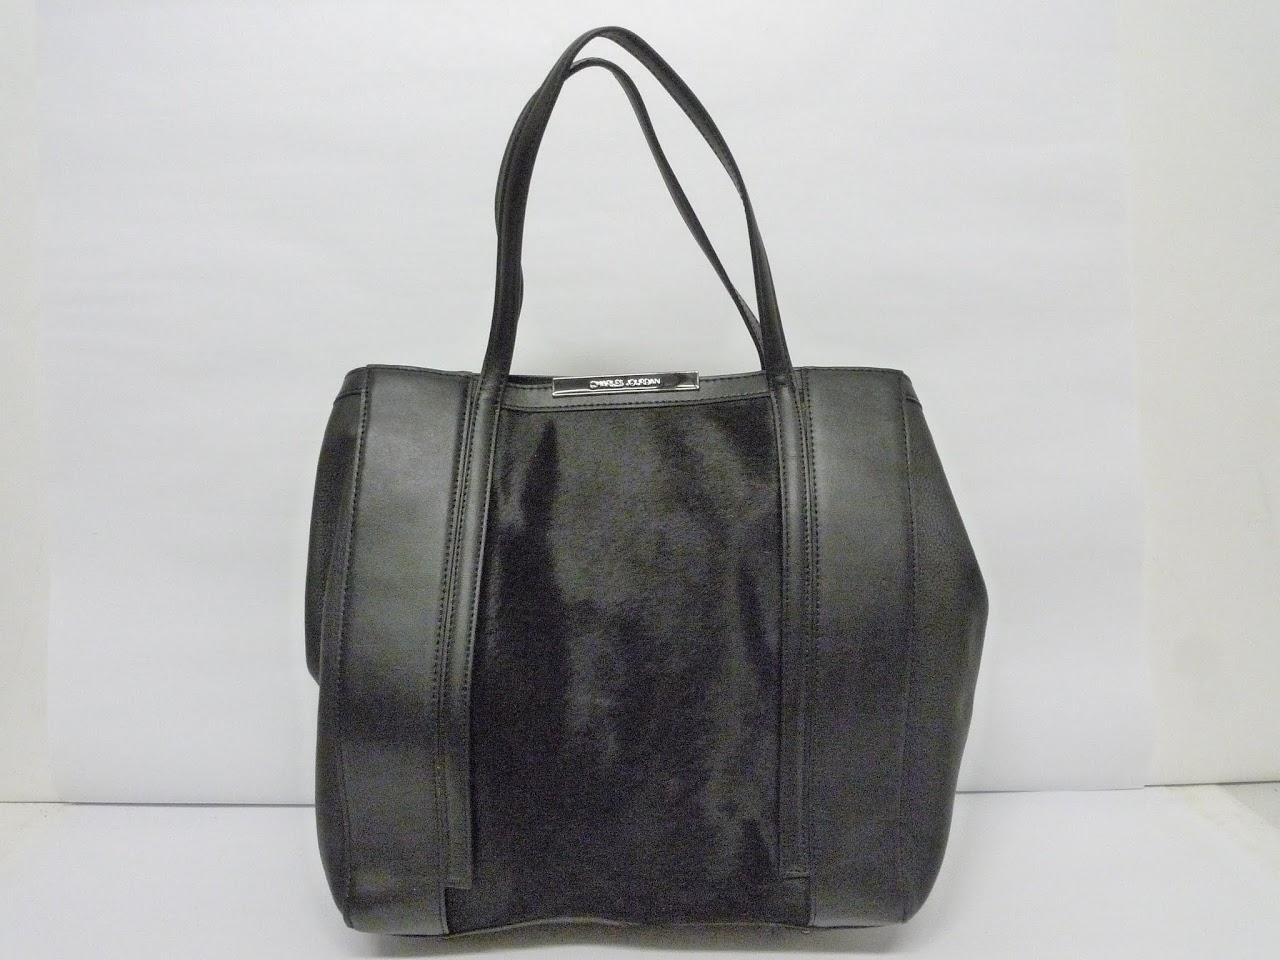 Charles Jourdan Shoulder Bag